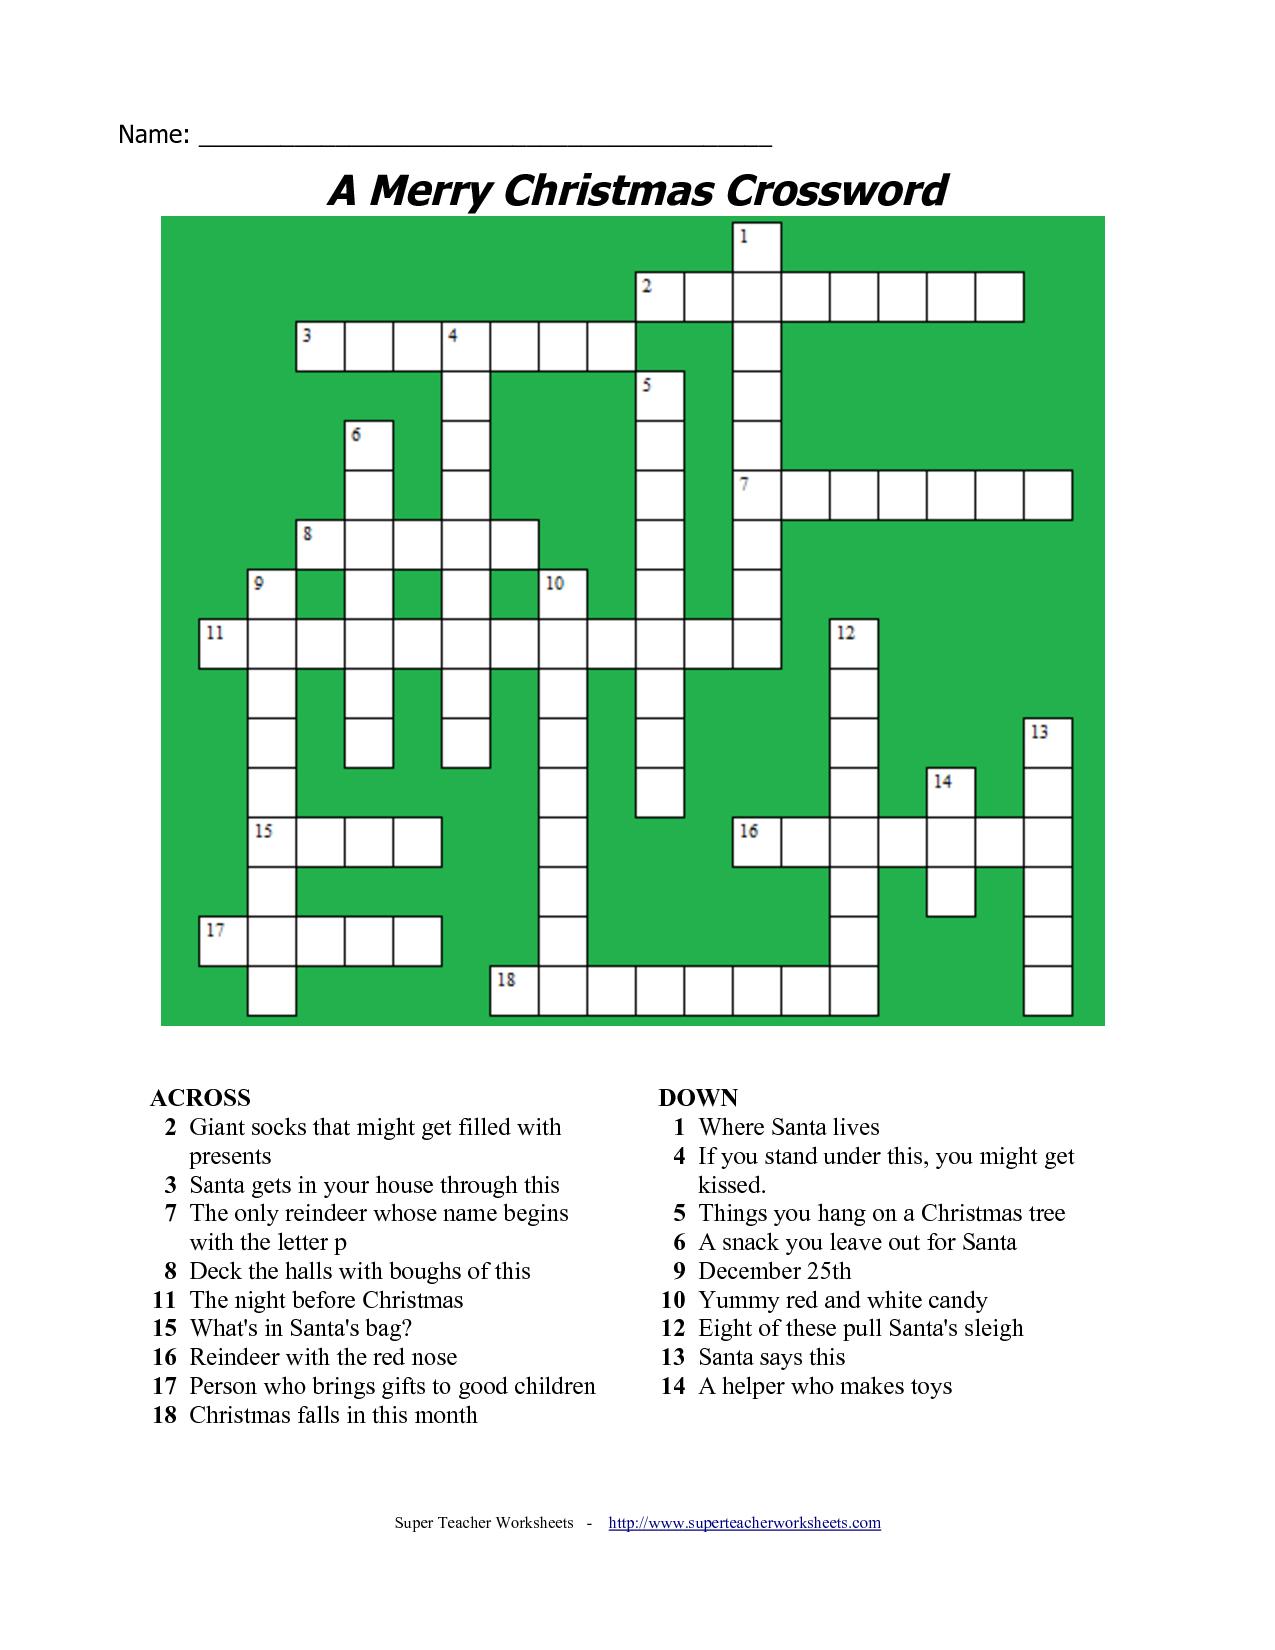 20 Fun Printable Christmas Crossword Puzzles   Kittybabylove - Free Printable Xmas Crossword